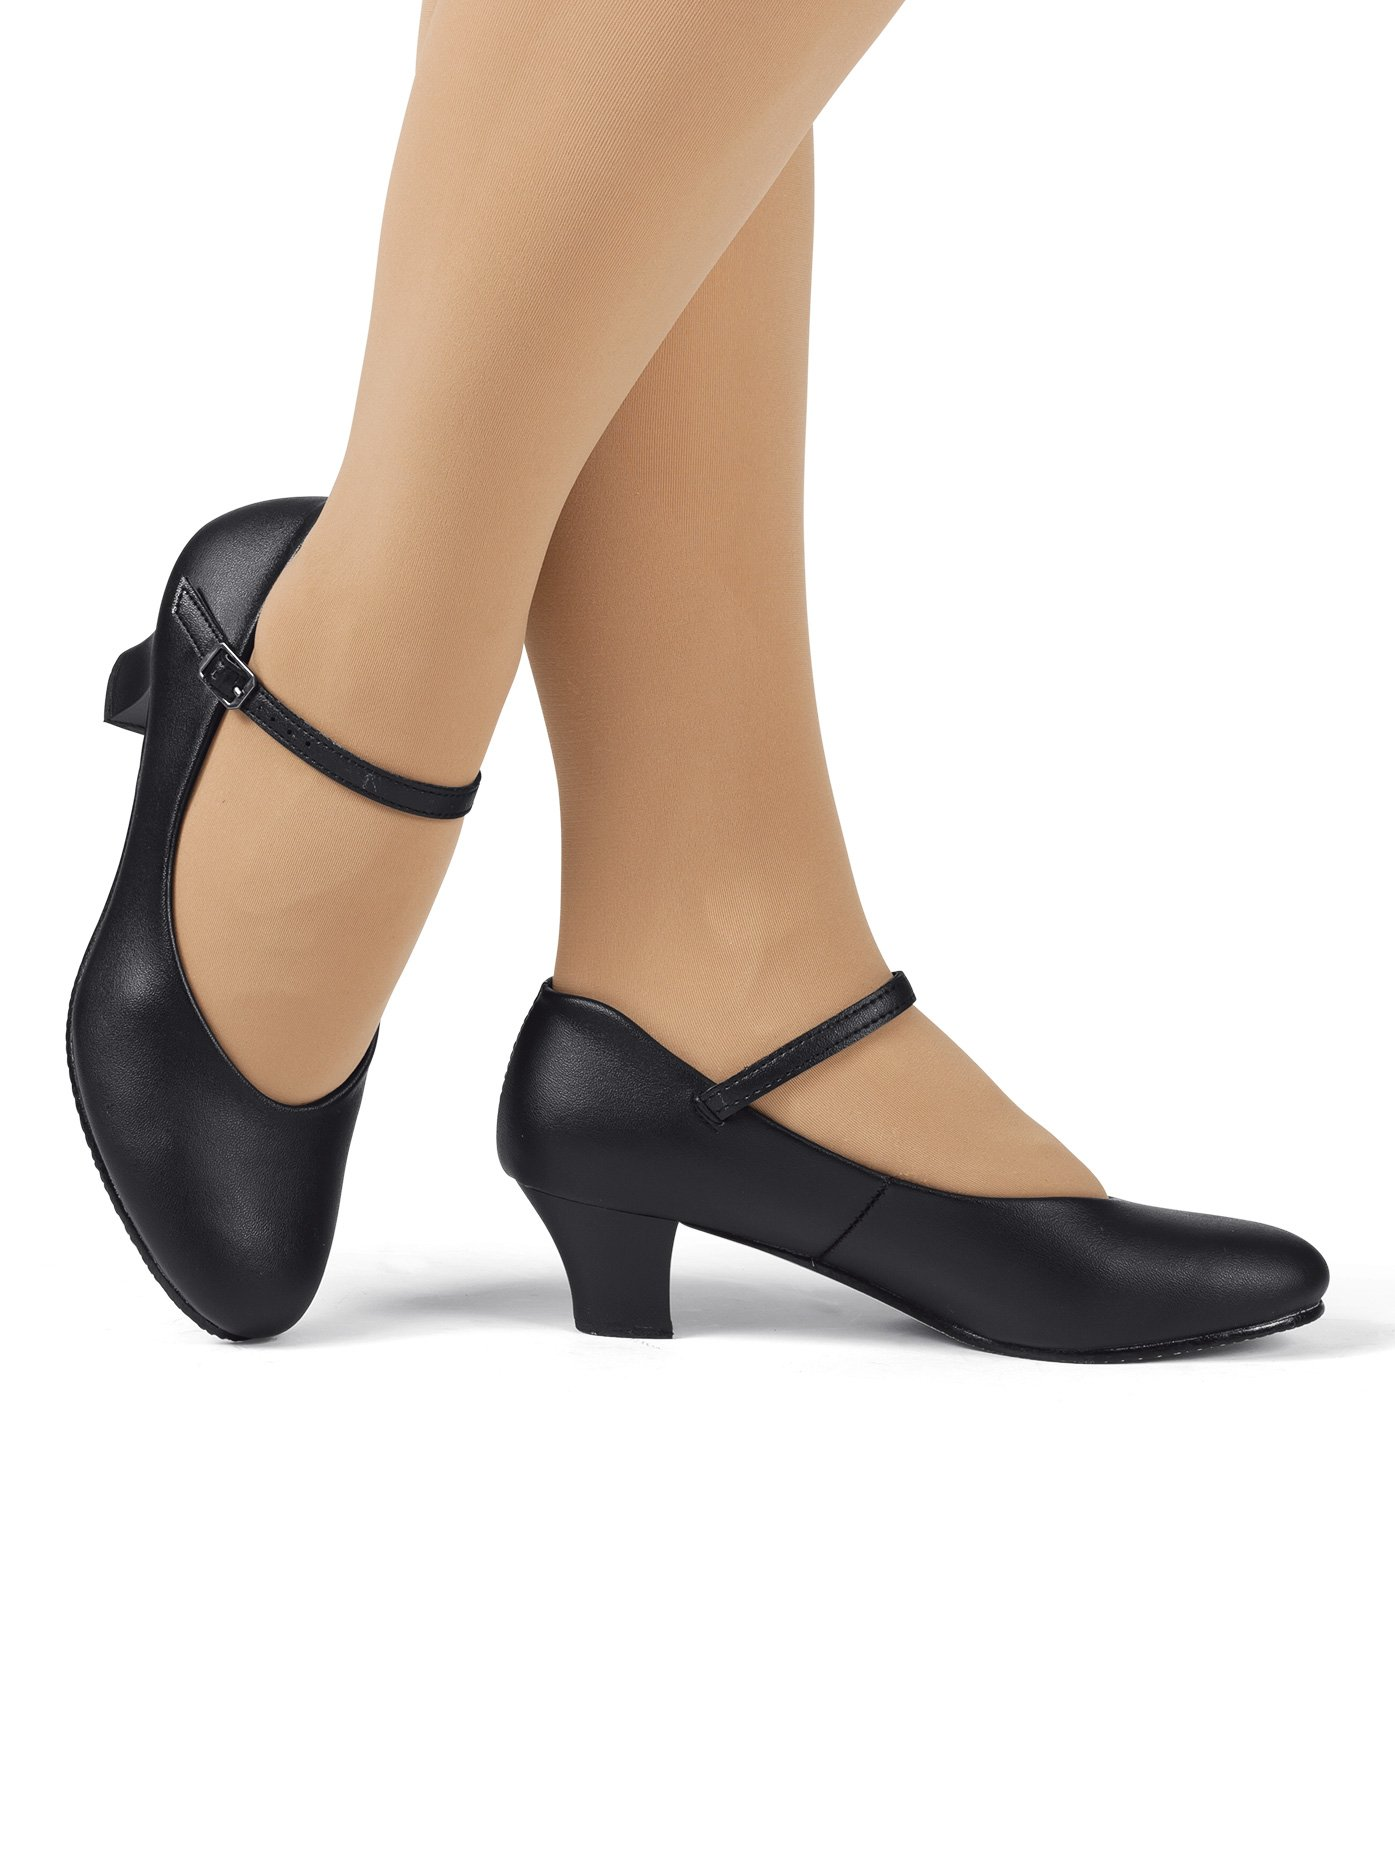 Adult 2'' Heel Character Shoes,T3200BLK07.5,Black,07.5